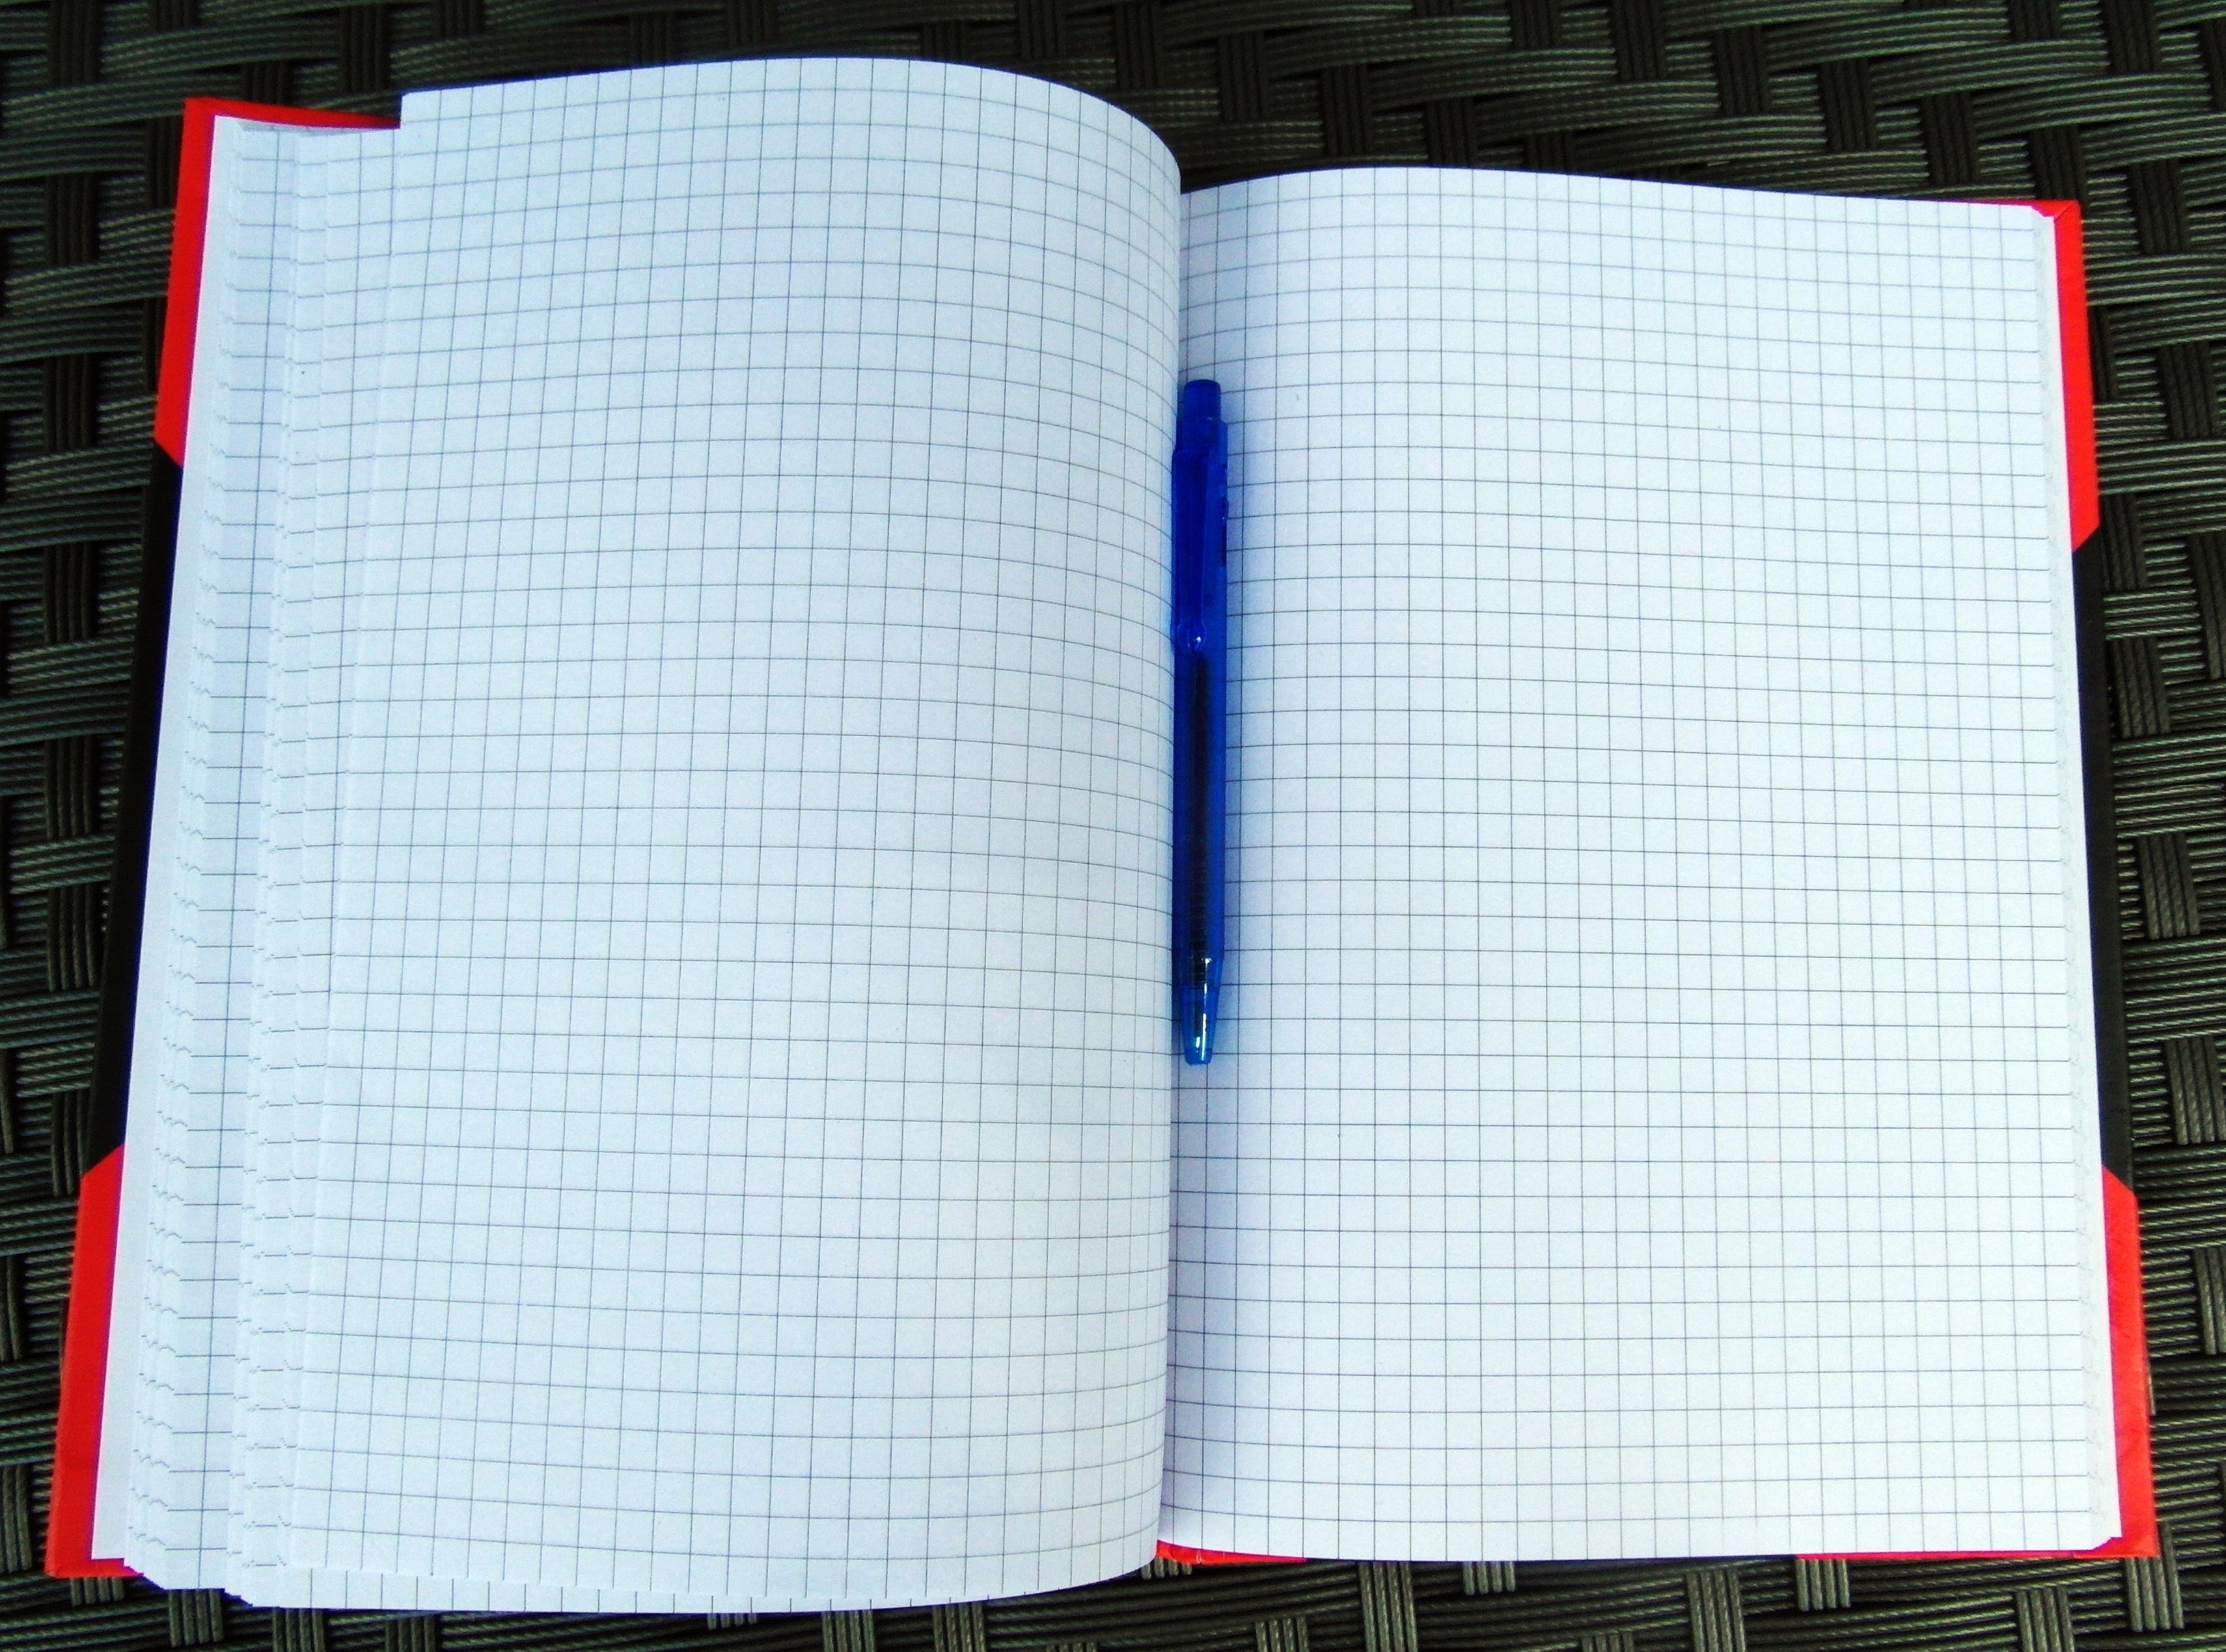 Notebook notes open